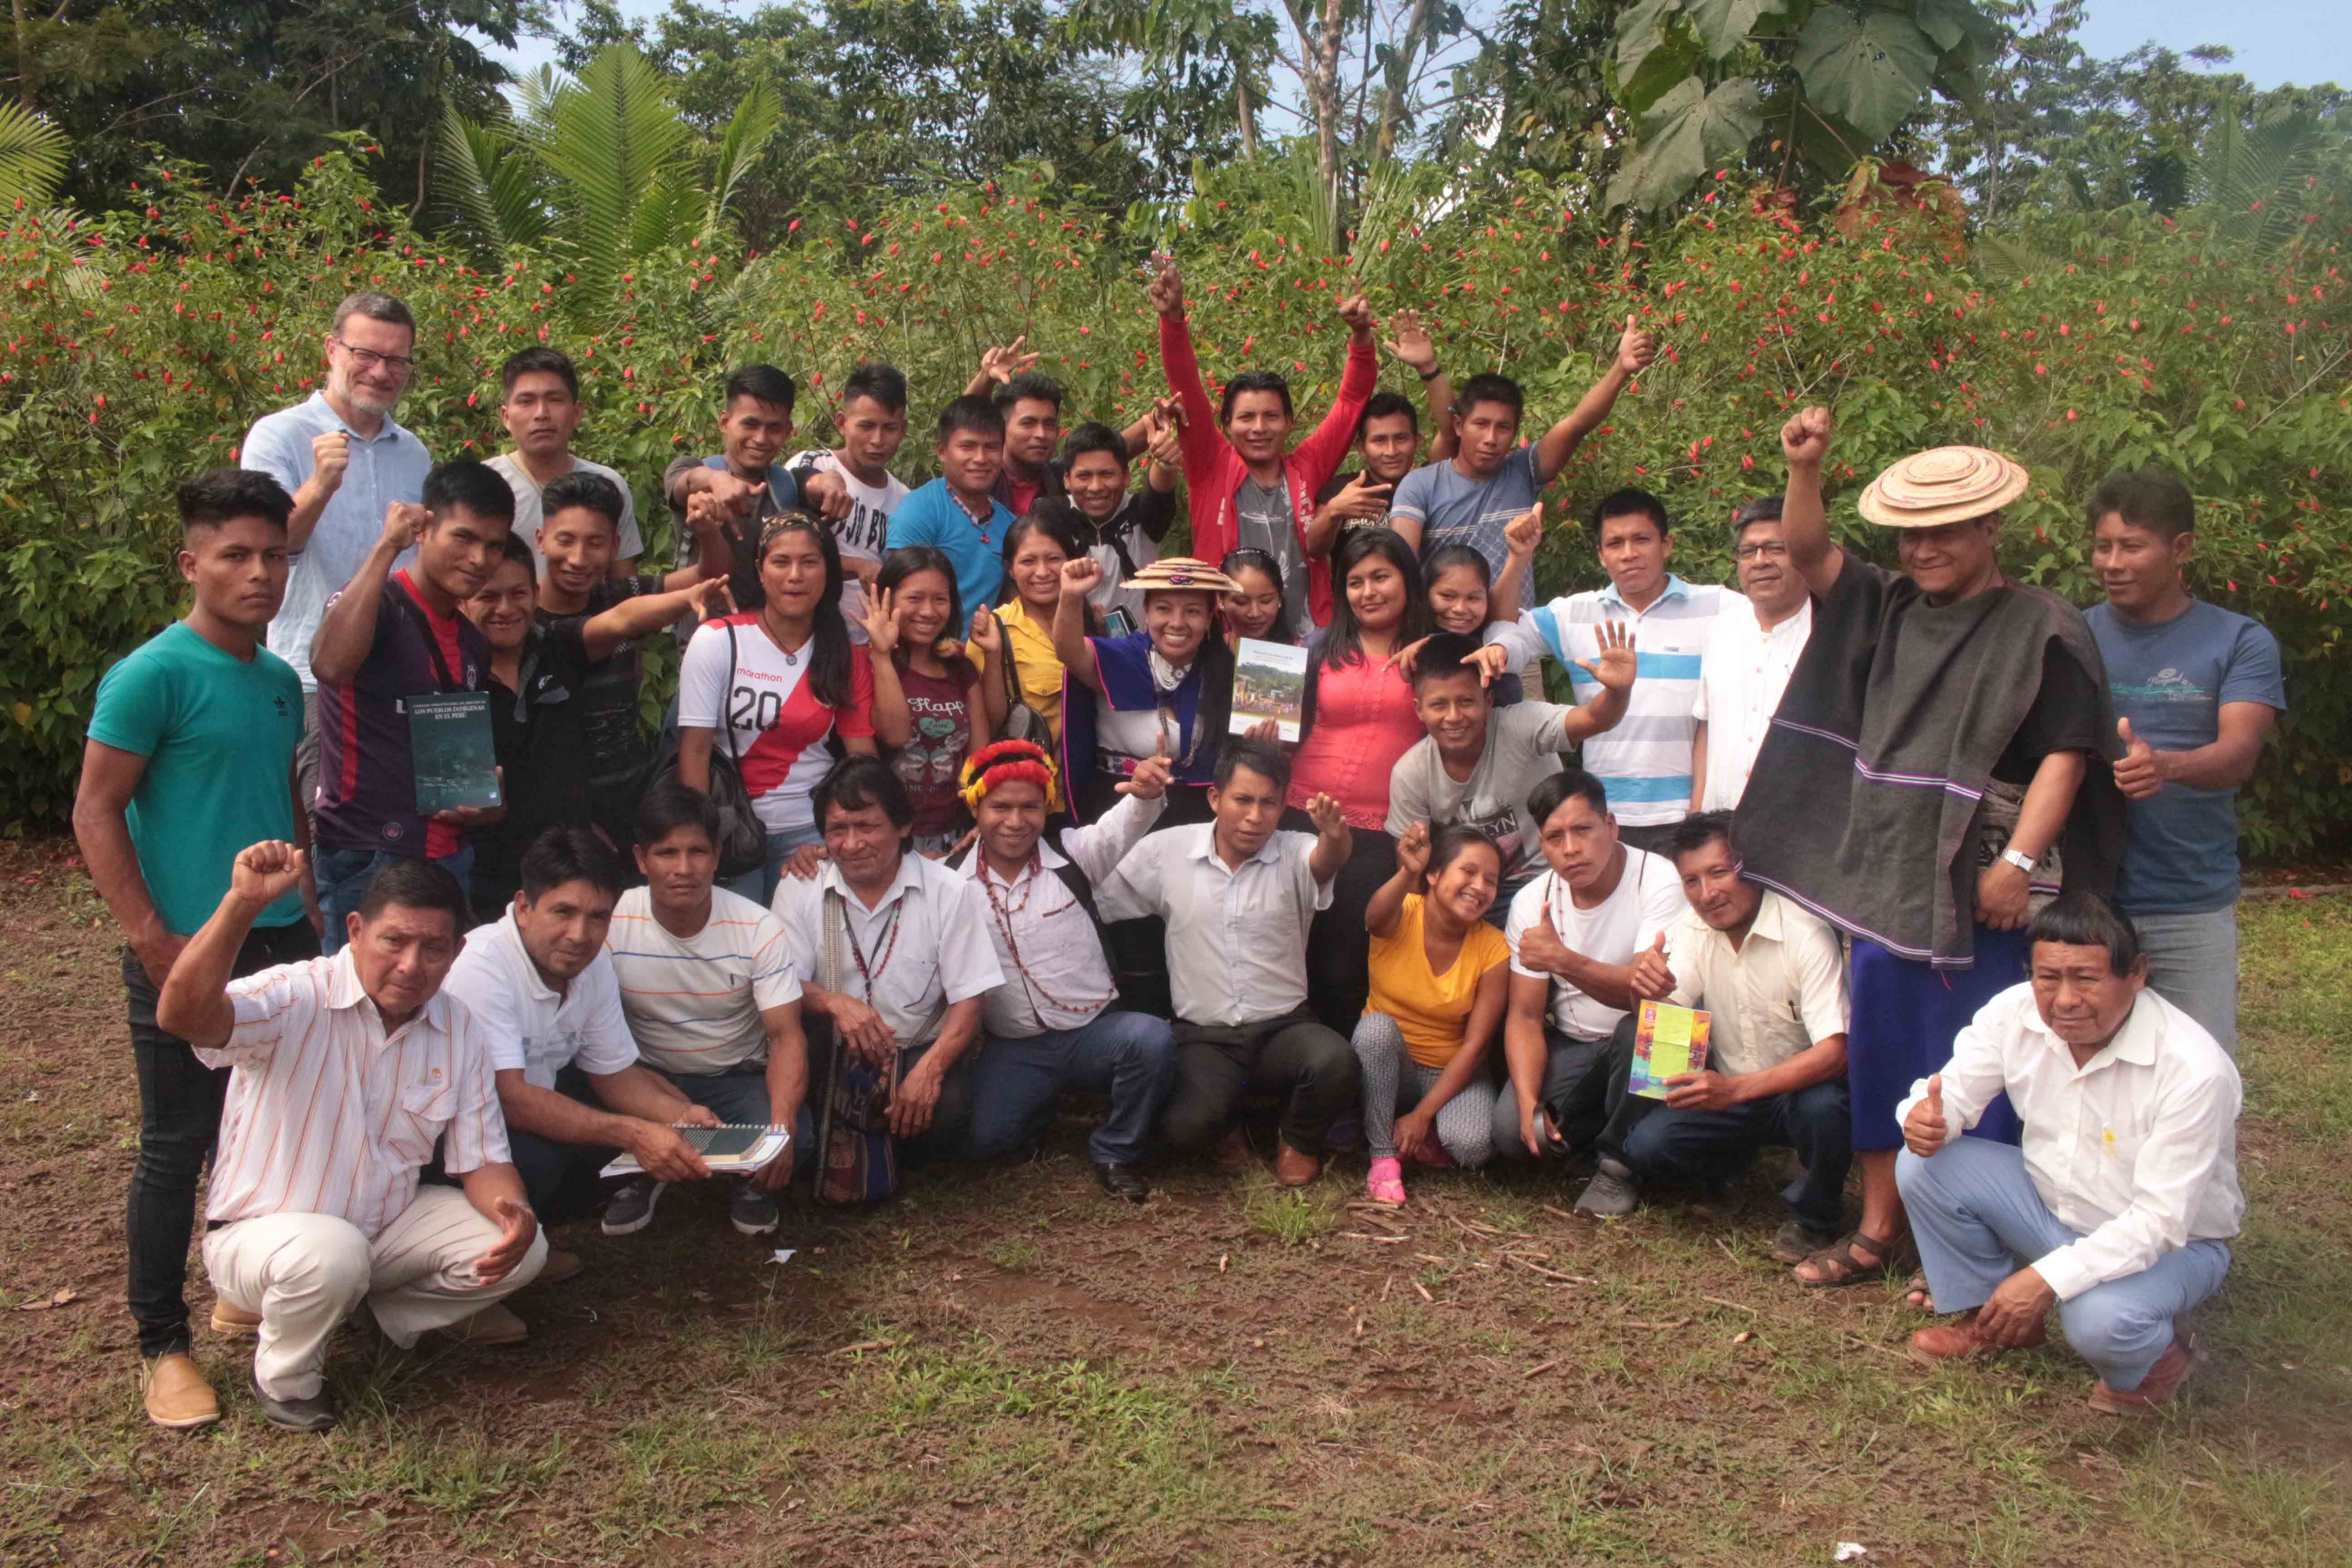 Escuela Sharian: Jóvenes Wampis camino a ser futuros líderes